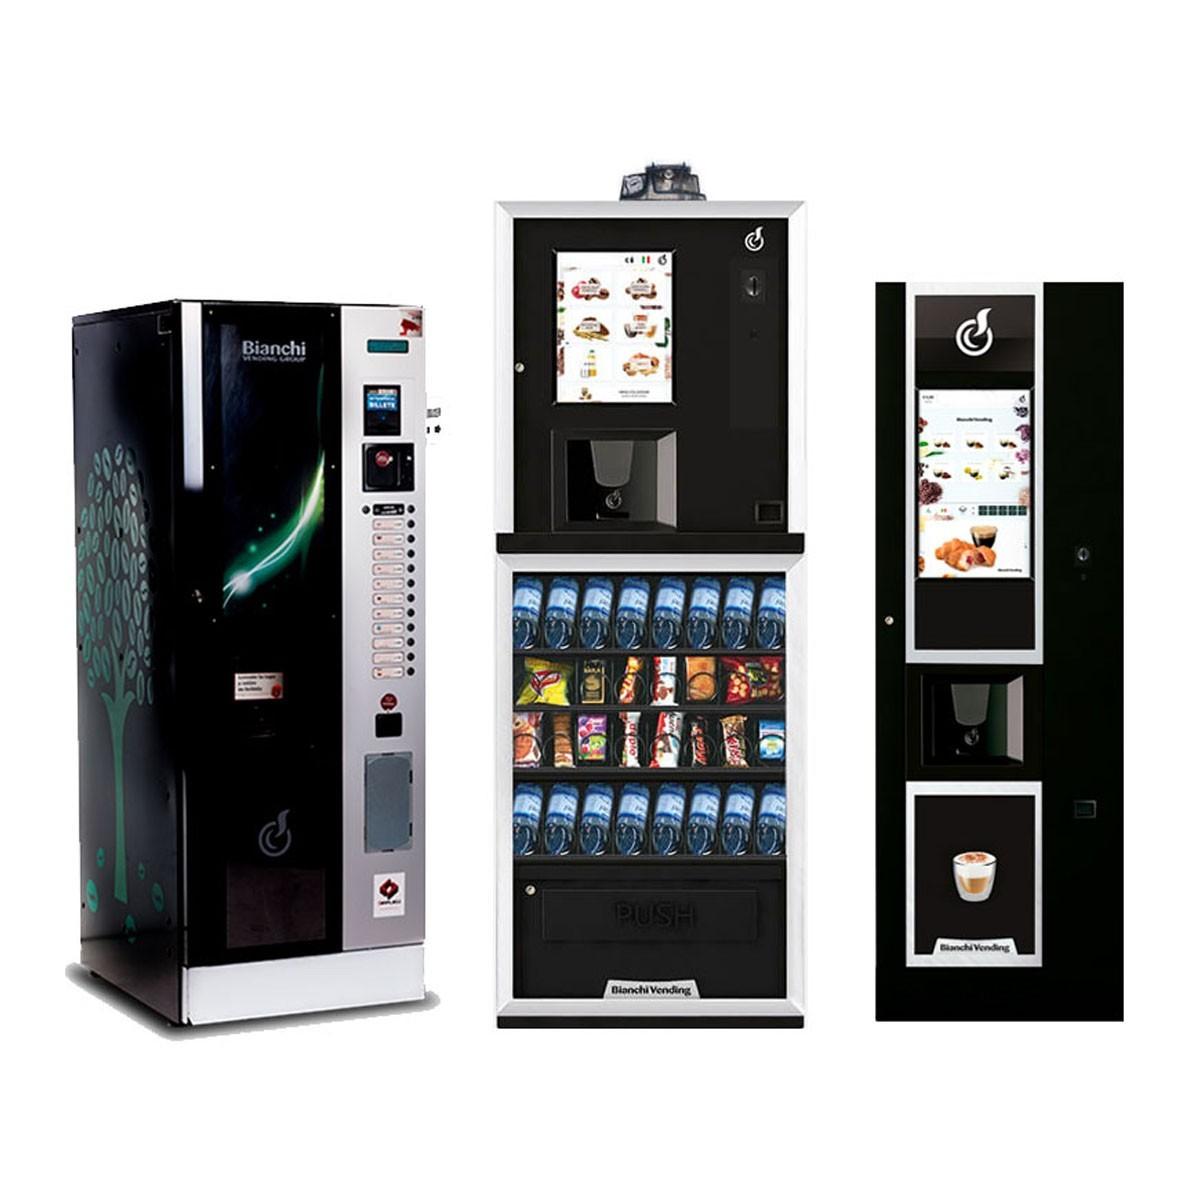 Máquina FC Machine Coffe Machines Auto Serviço